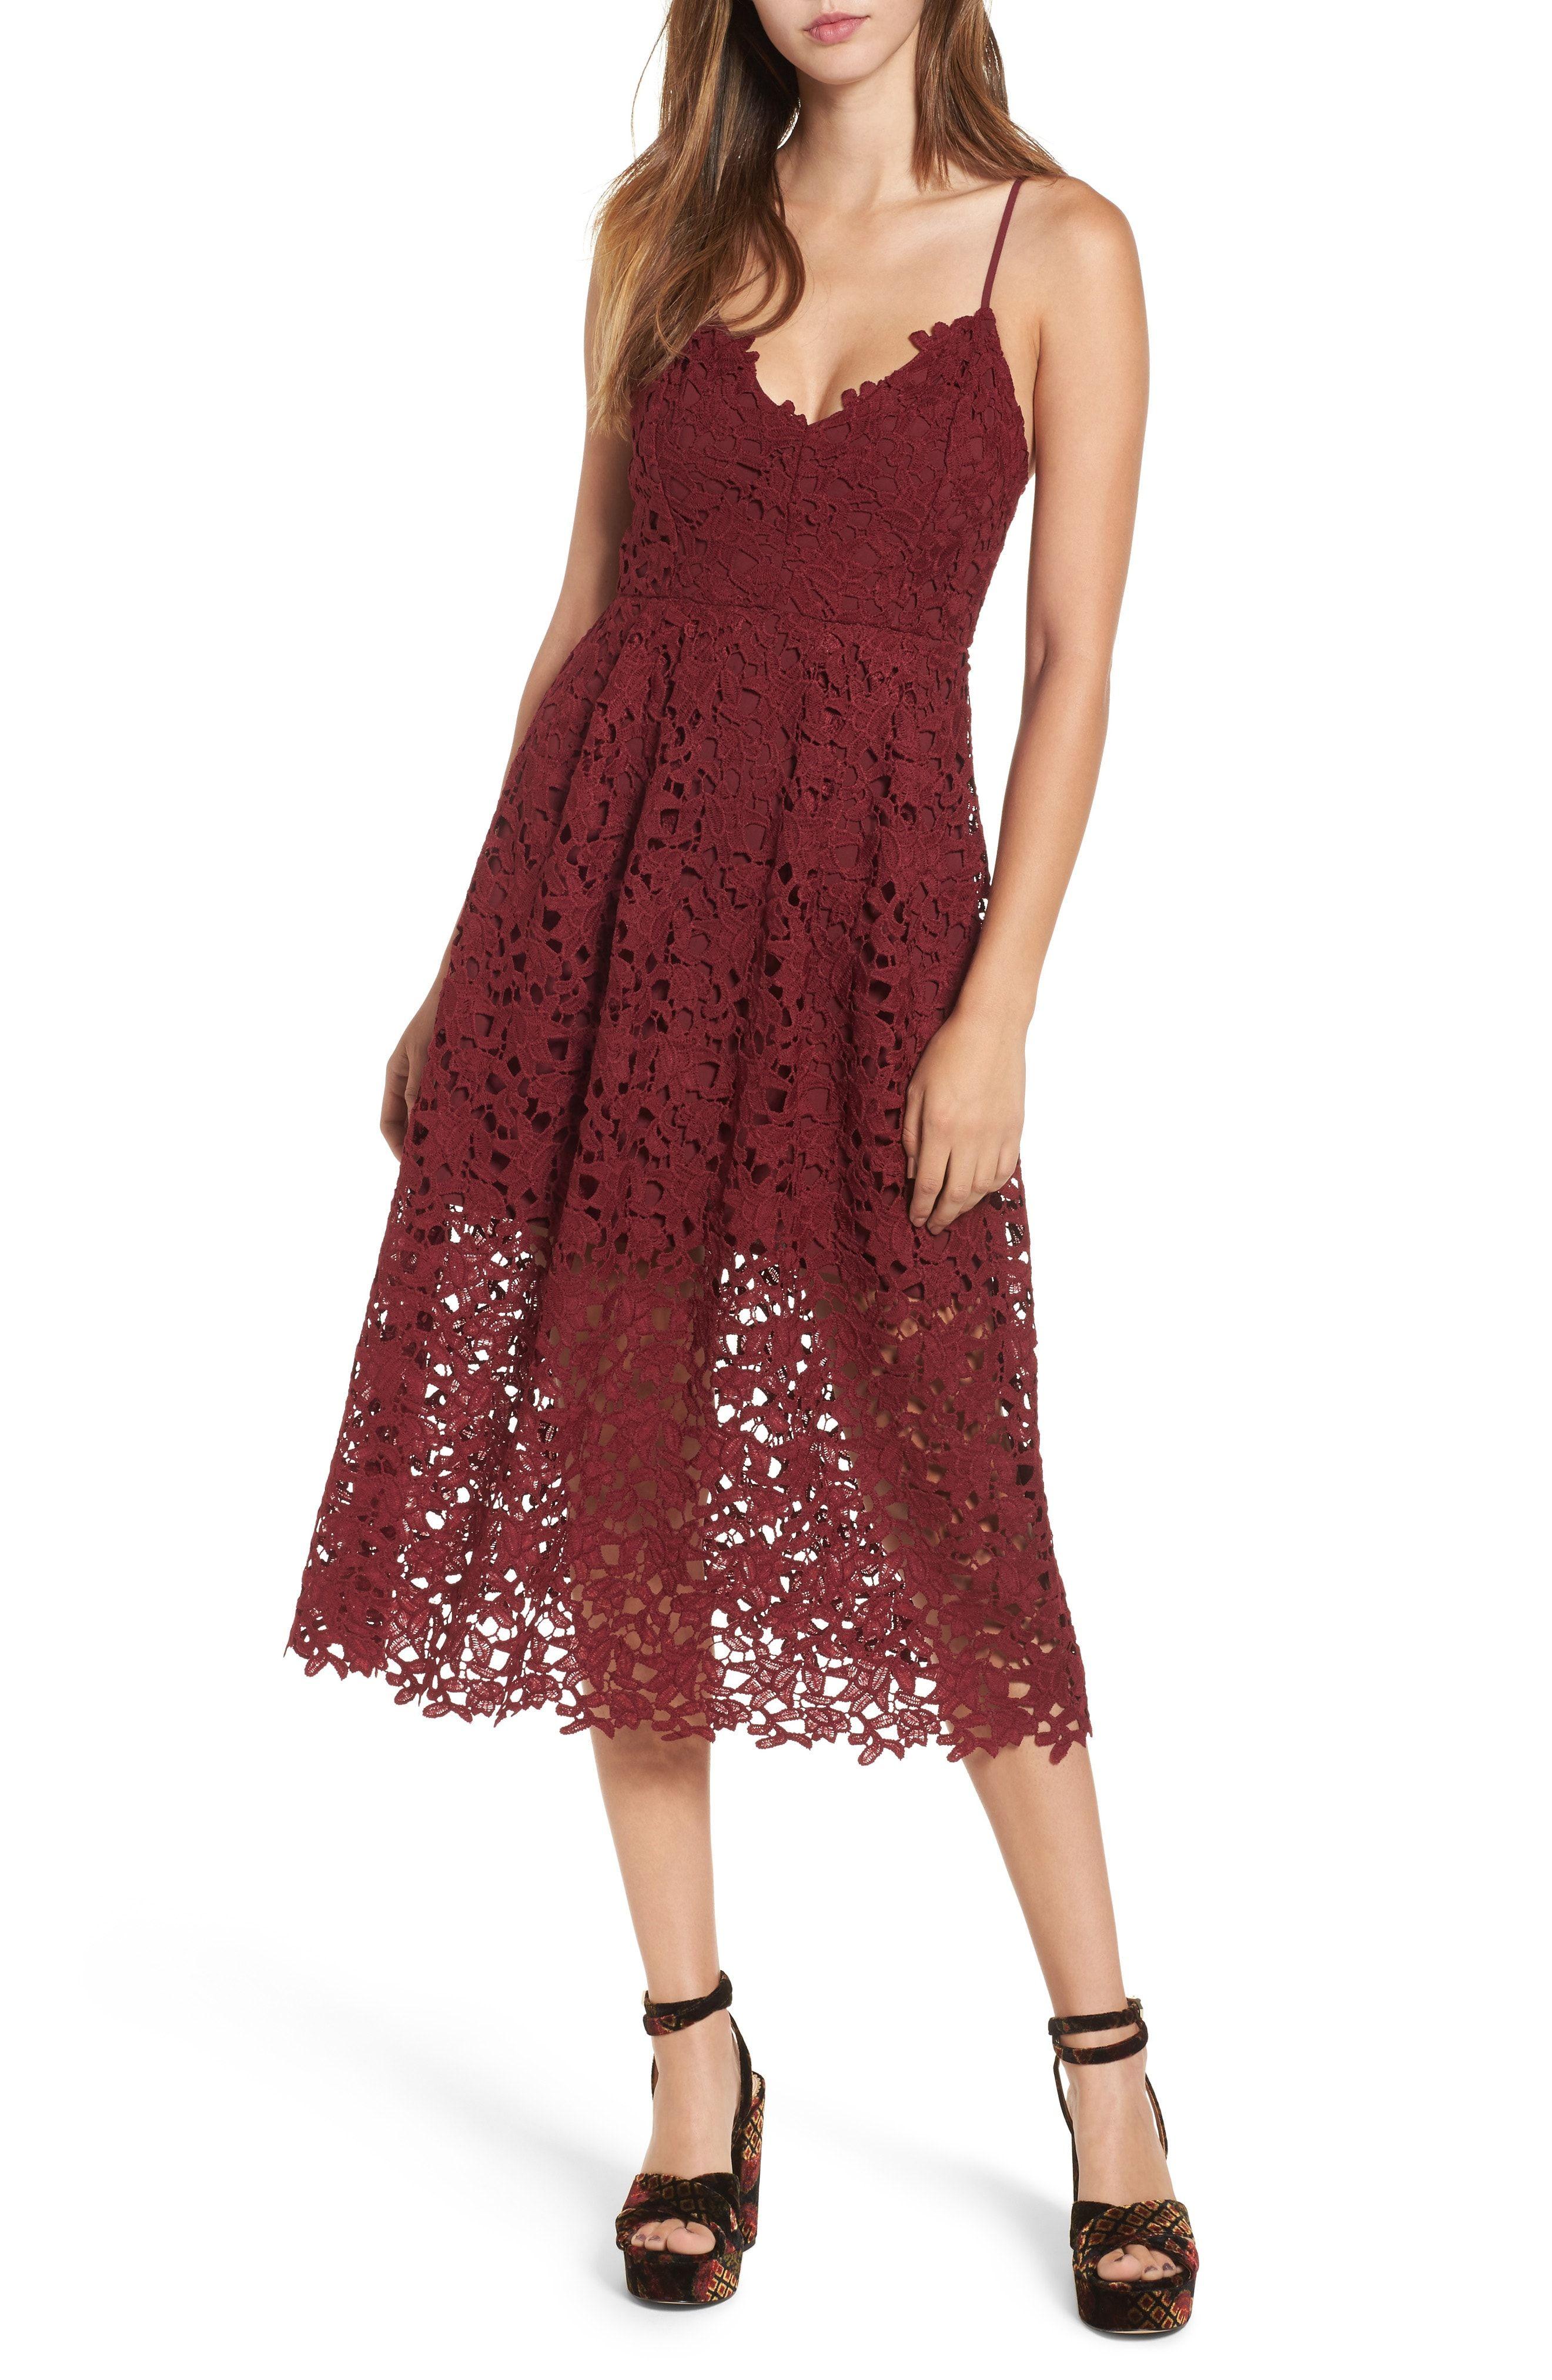 The Best Fall Wedding Guest Dresses  fall fashion  Pinterest